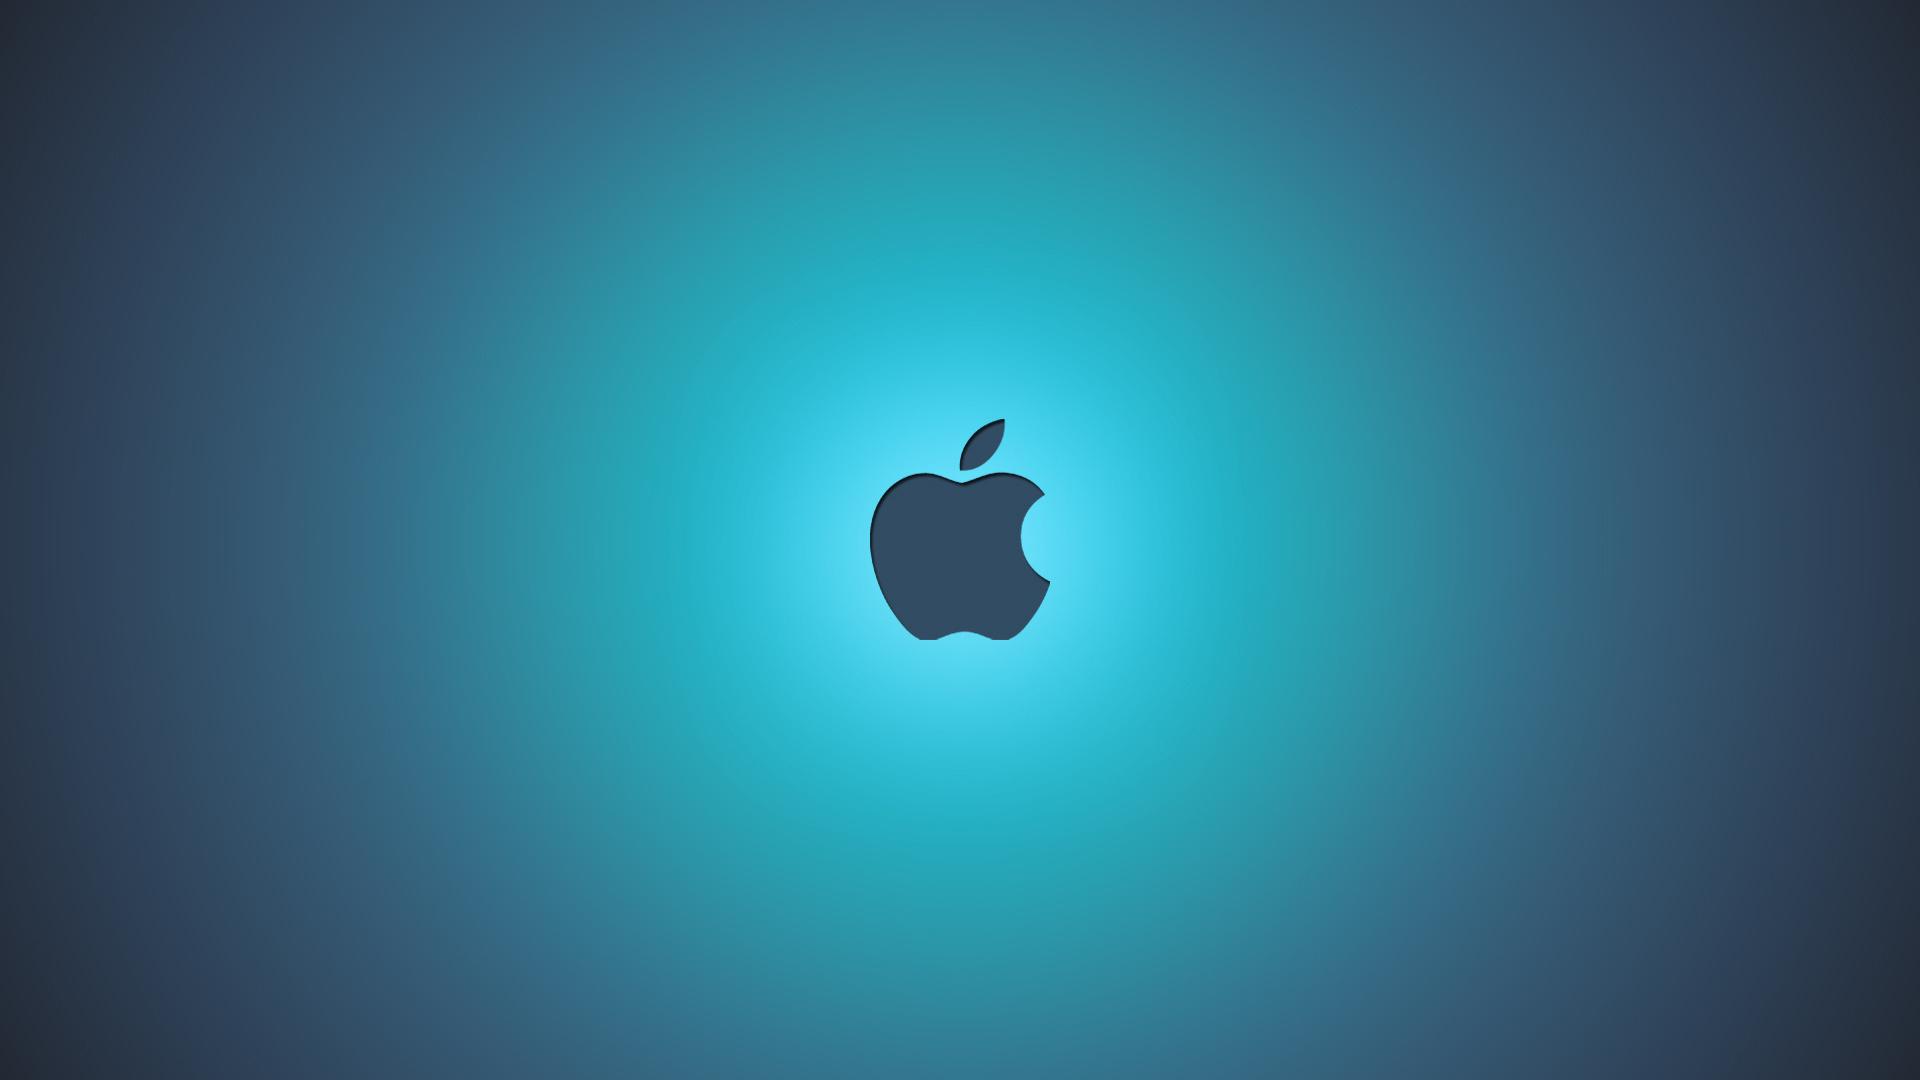 Apple Blue Background Wallpaper Desktop 6250 Wallpaper 1920x1080